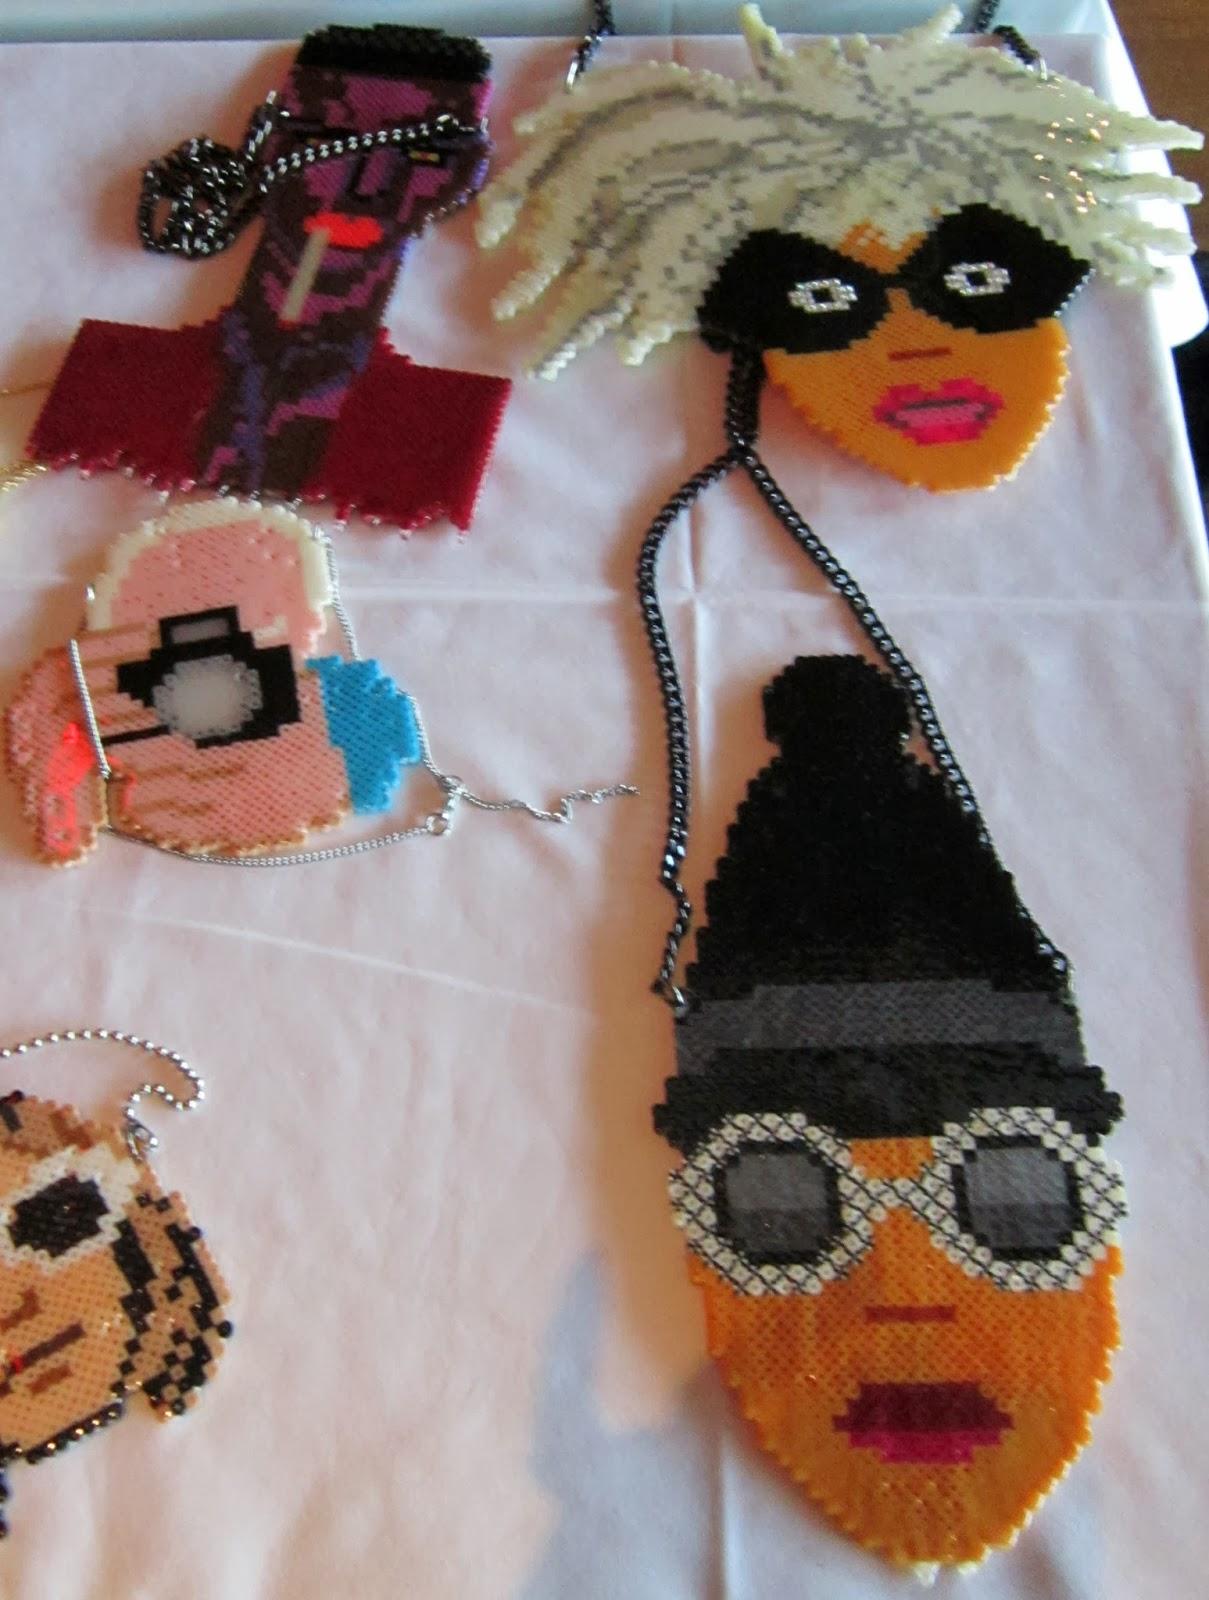 Idiosyncratic Fashionistas: Runway The Real Way at Yotel Fashion ...